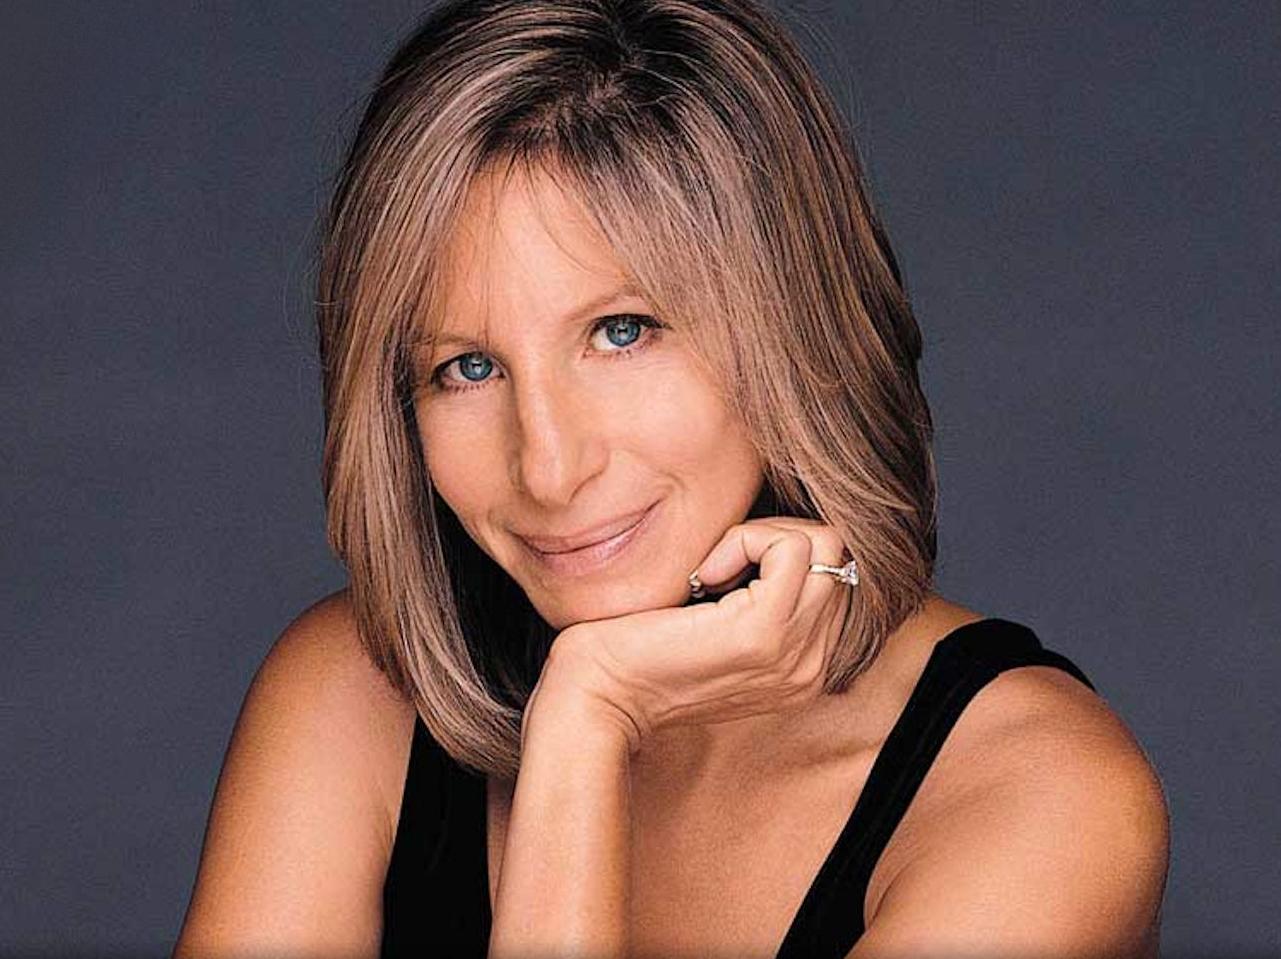 Barbra Streisand Calls Obama 'Transparent,' Rips McCain on Benghazi-Gate